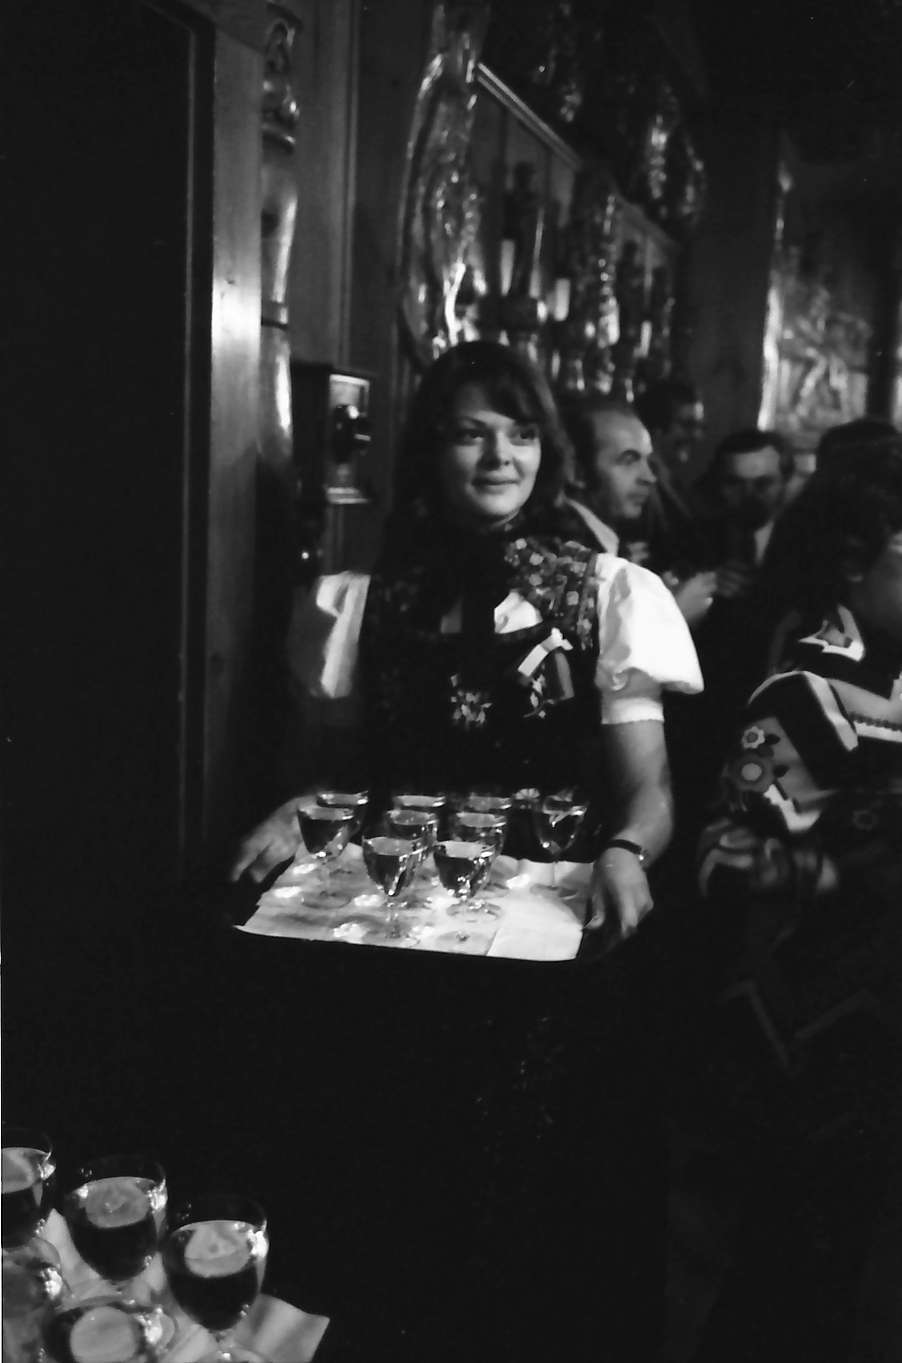 Triberg: Empfang im holzgeschnitzten Saal des Rathauses, Bild 1